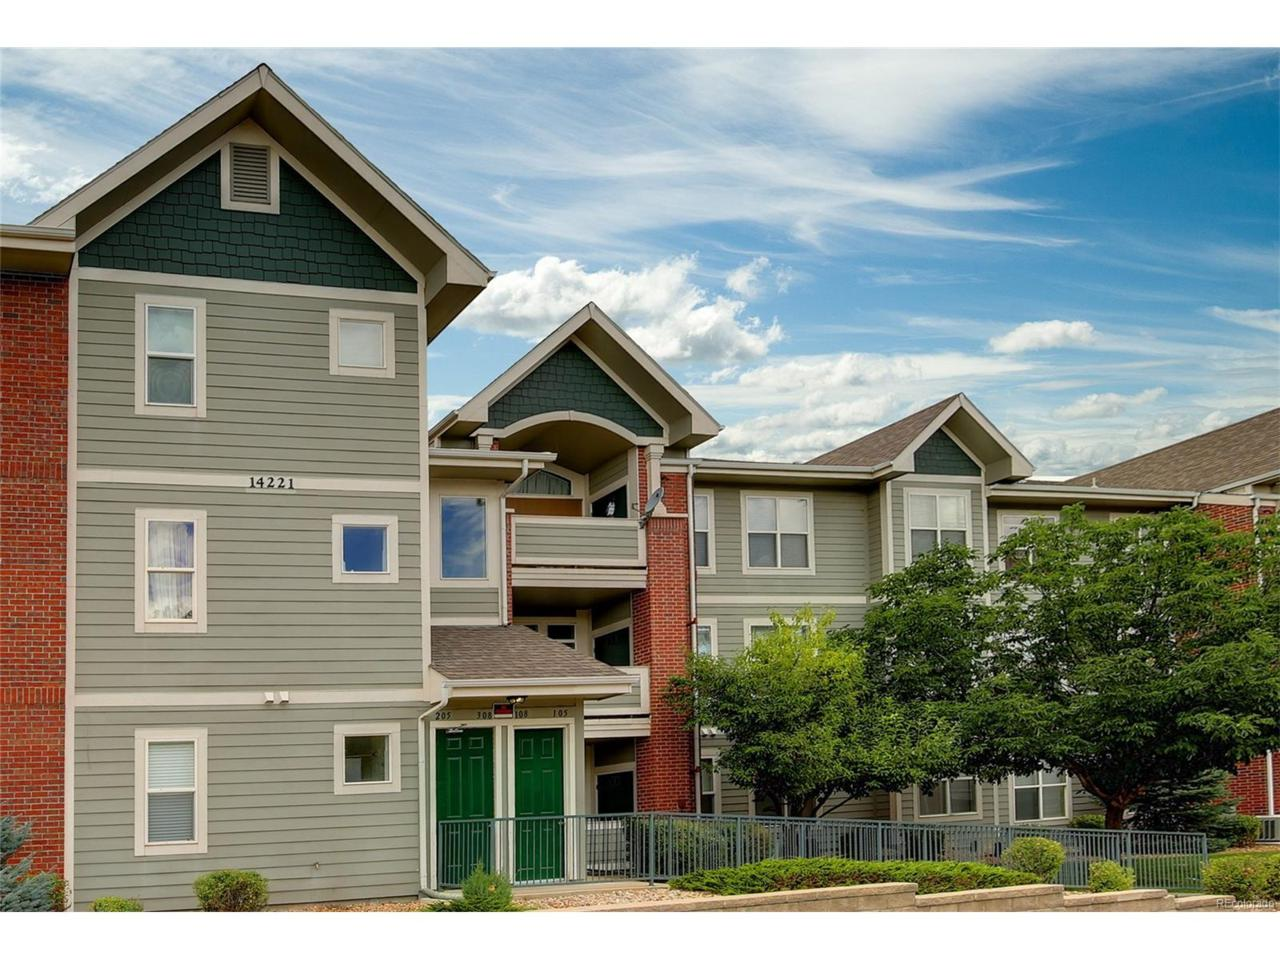 14221 E 1st Drive #306, Aurora, CO 80011 (MLS #8774557) :: 8z Real Estate